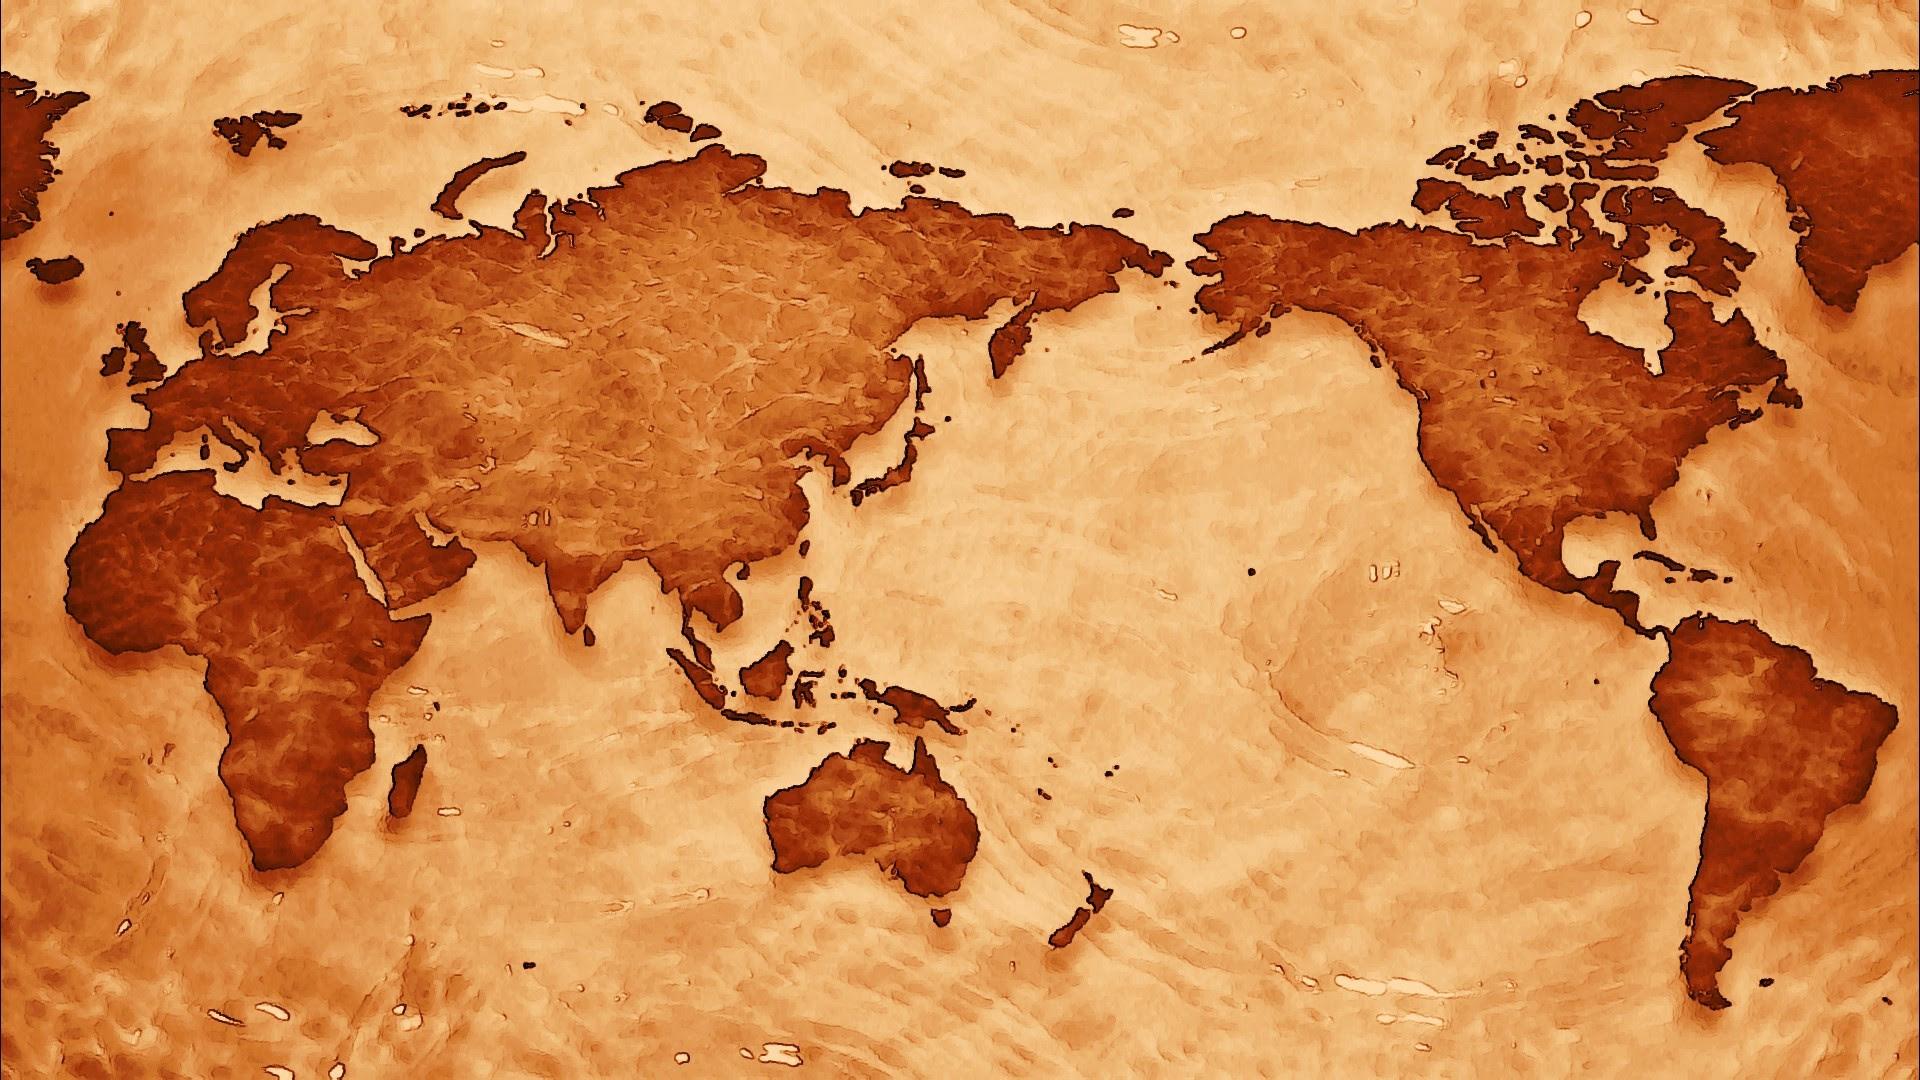 Antique World Map Wallpaper (39+ images)